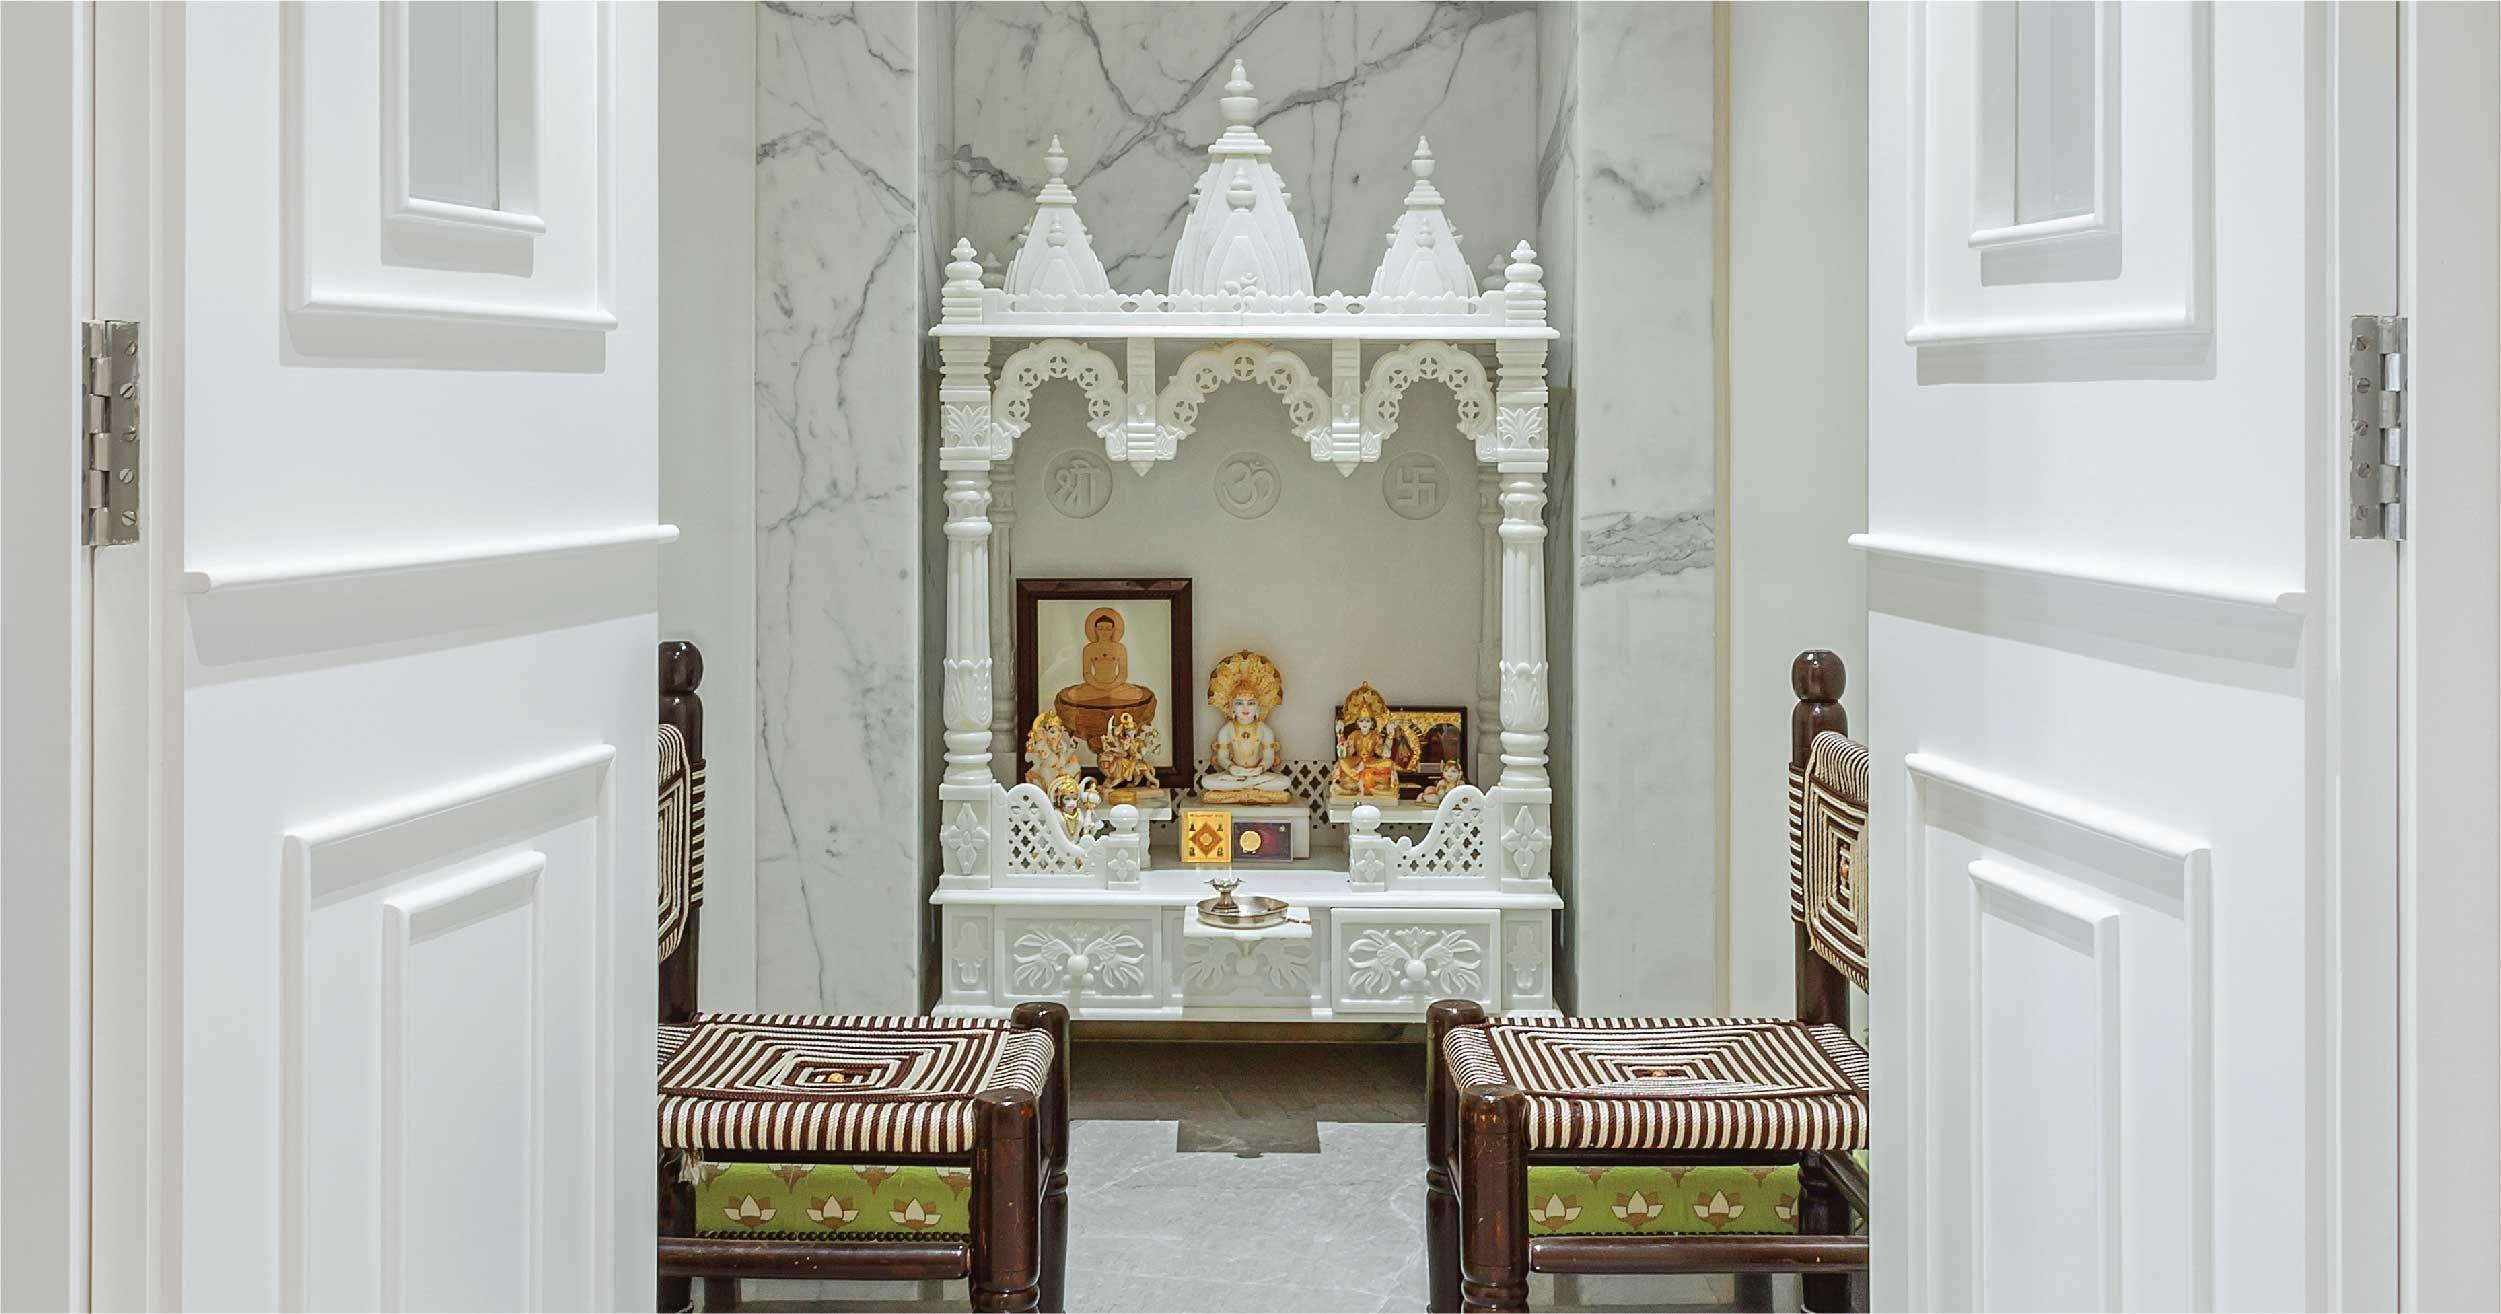 How to Fix Vastu Dosha in Your Pooja Room in 7 Simple Steps